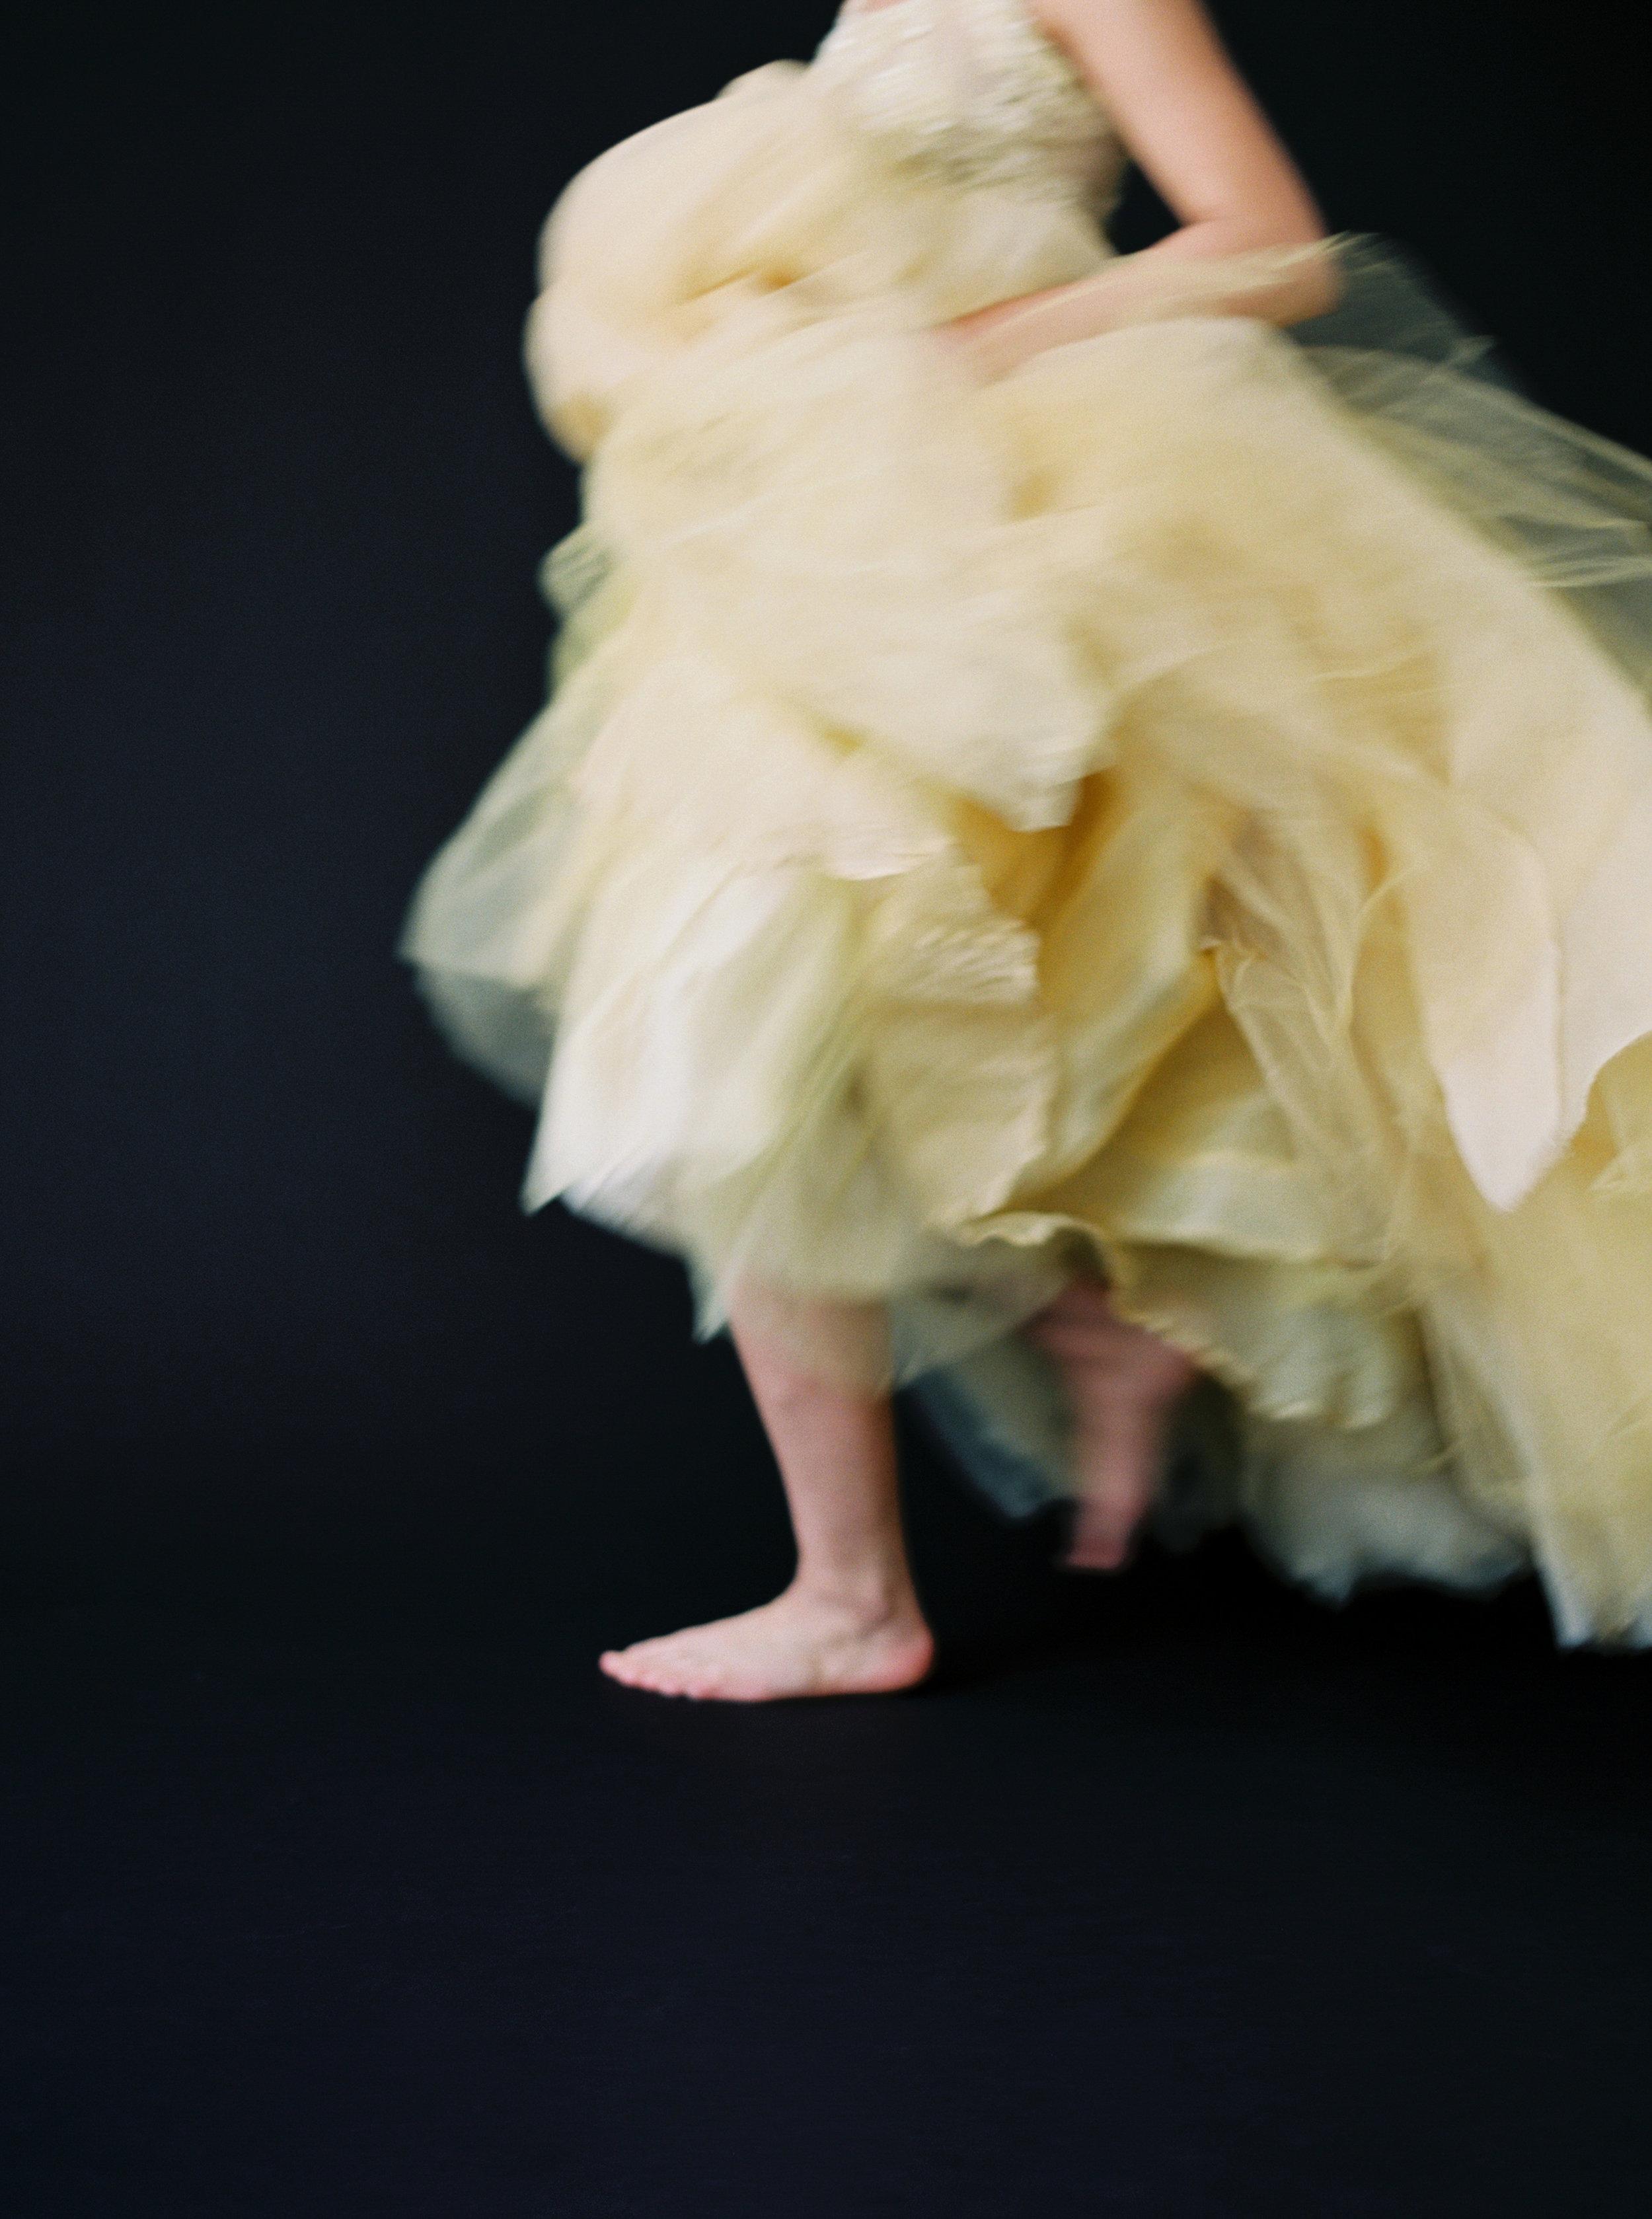 Carlos-Hernandez-Photography-028.jpg